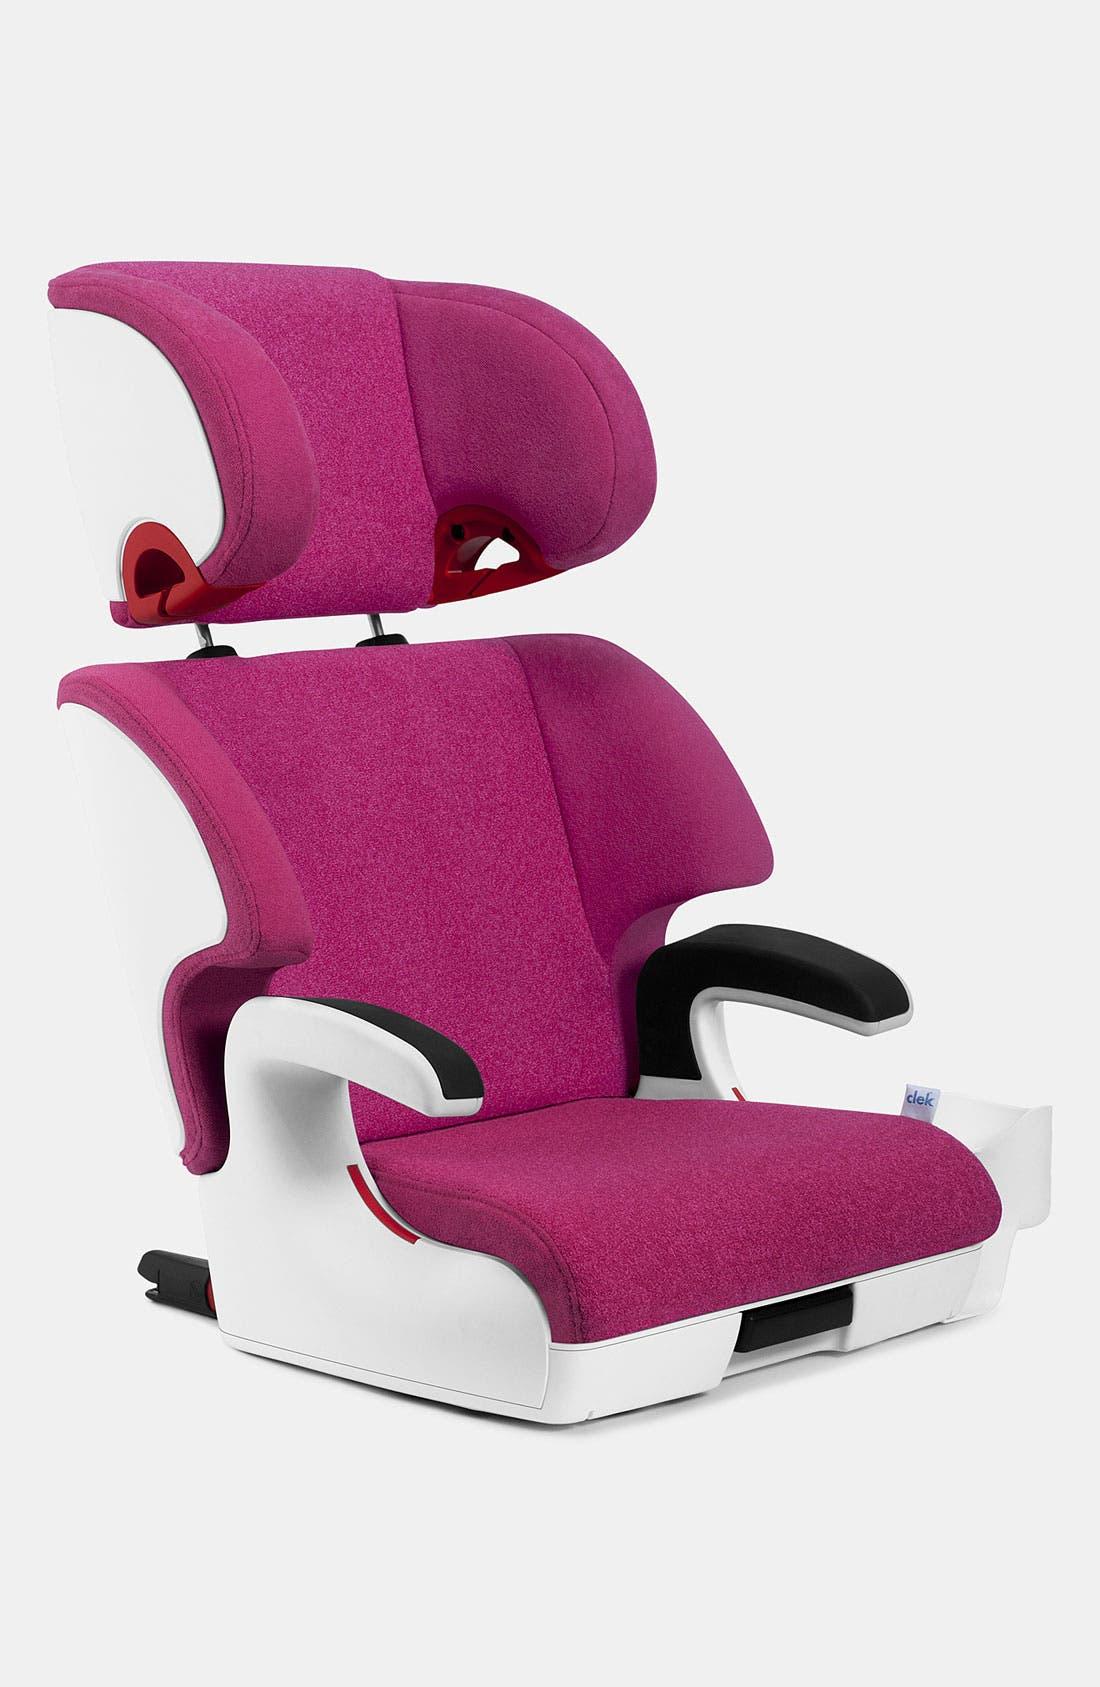 Alternate Image 1 Selected - Clek 'Oobr' Booster Seat